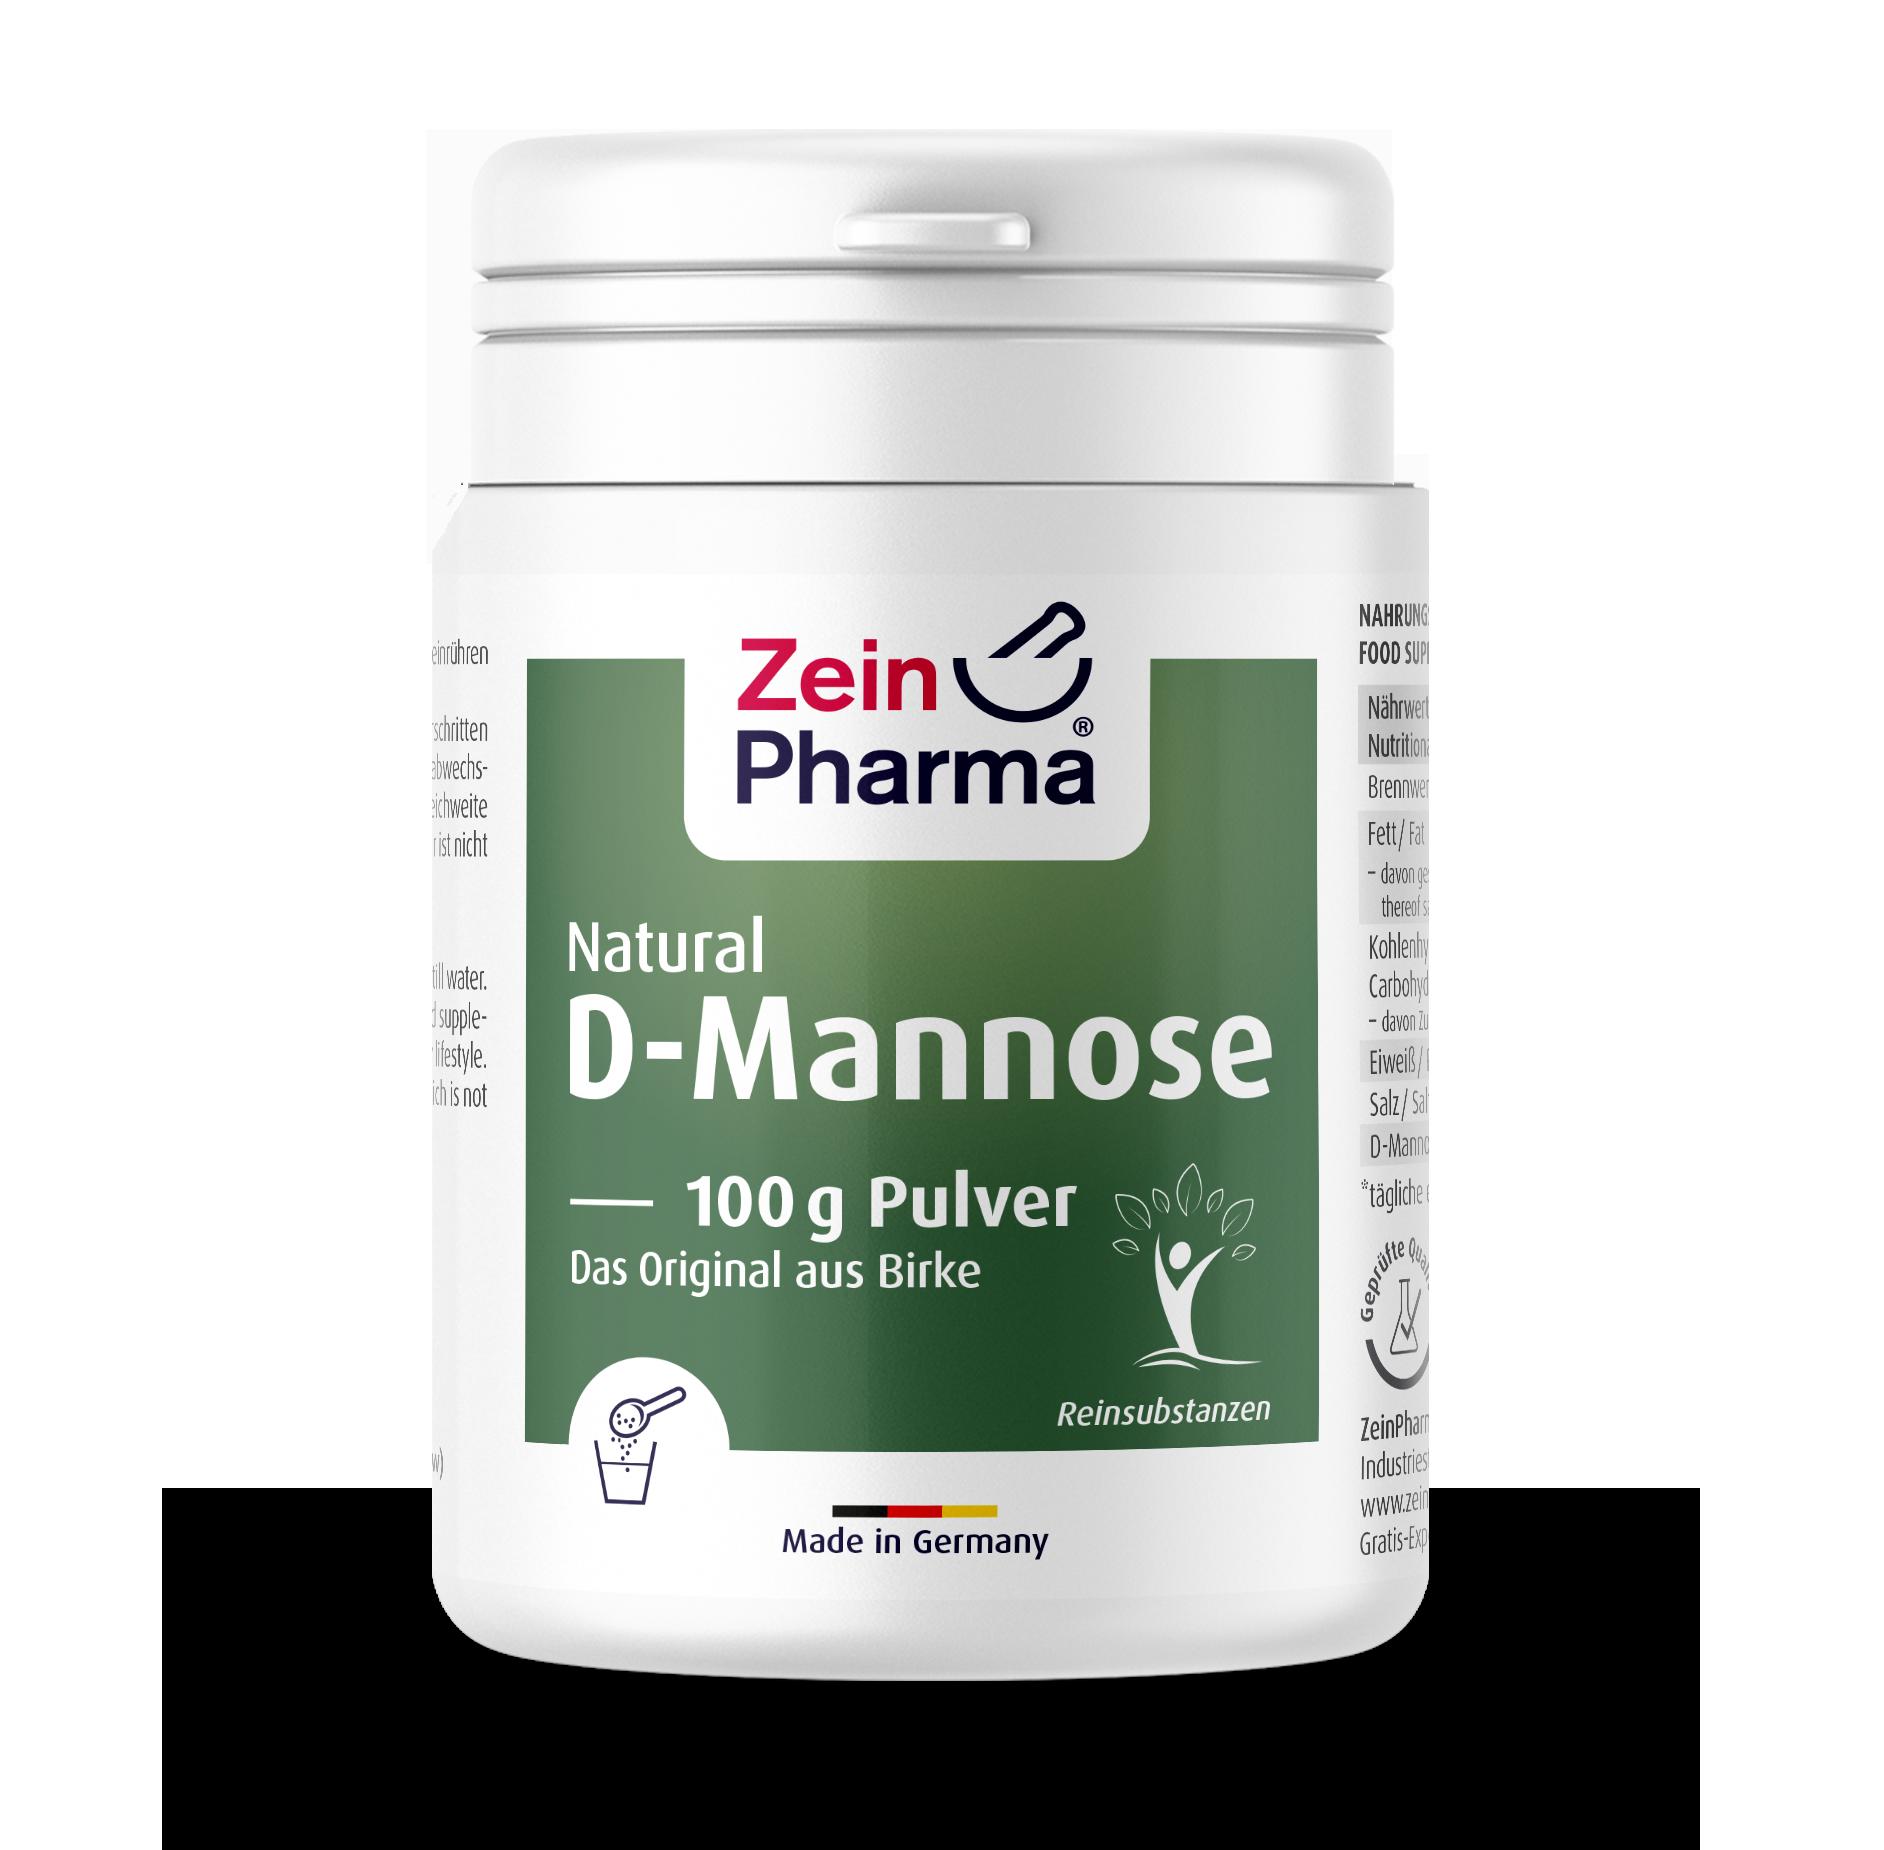 Natural D-Mannose 100 g Pulver